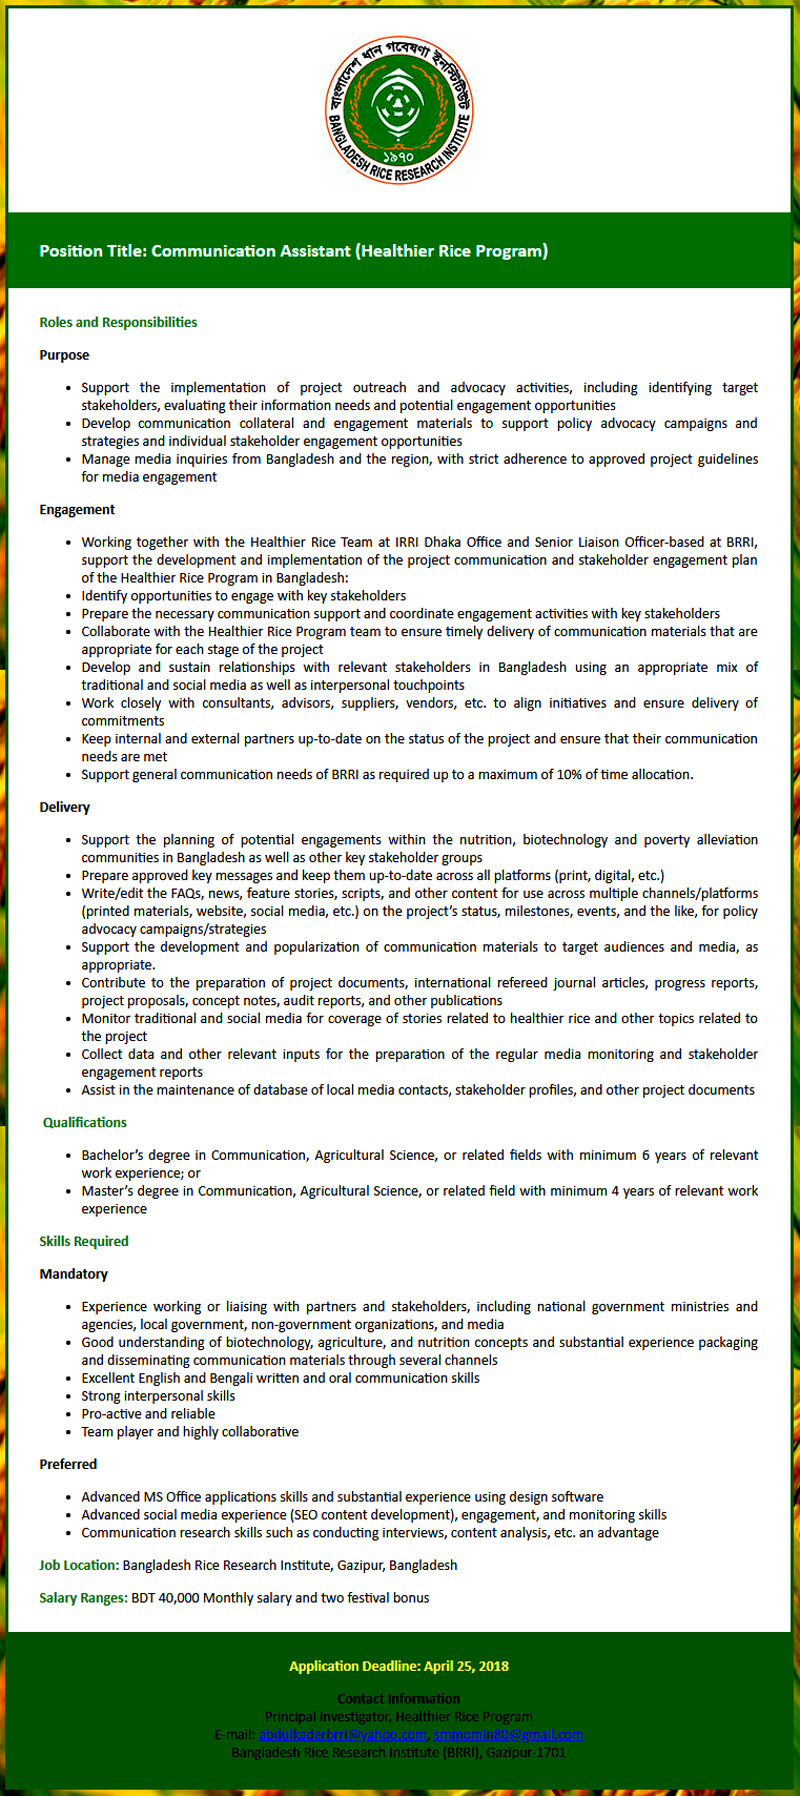 Bangladesh Rice Research Institute Job Circular 2018